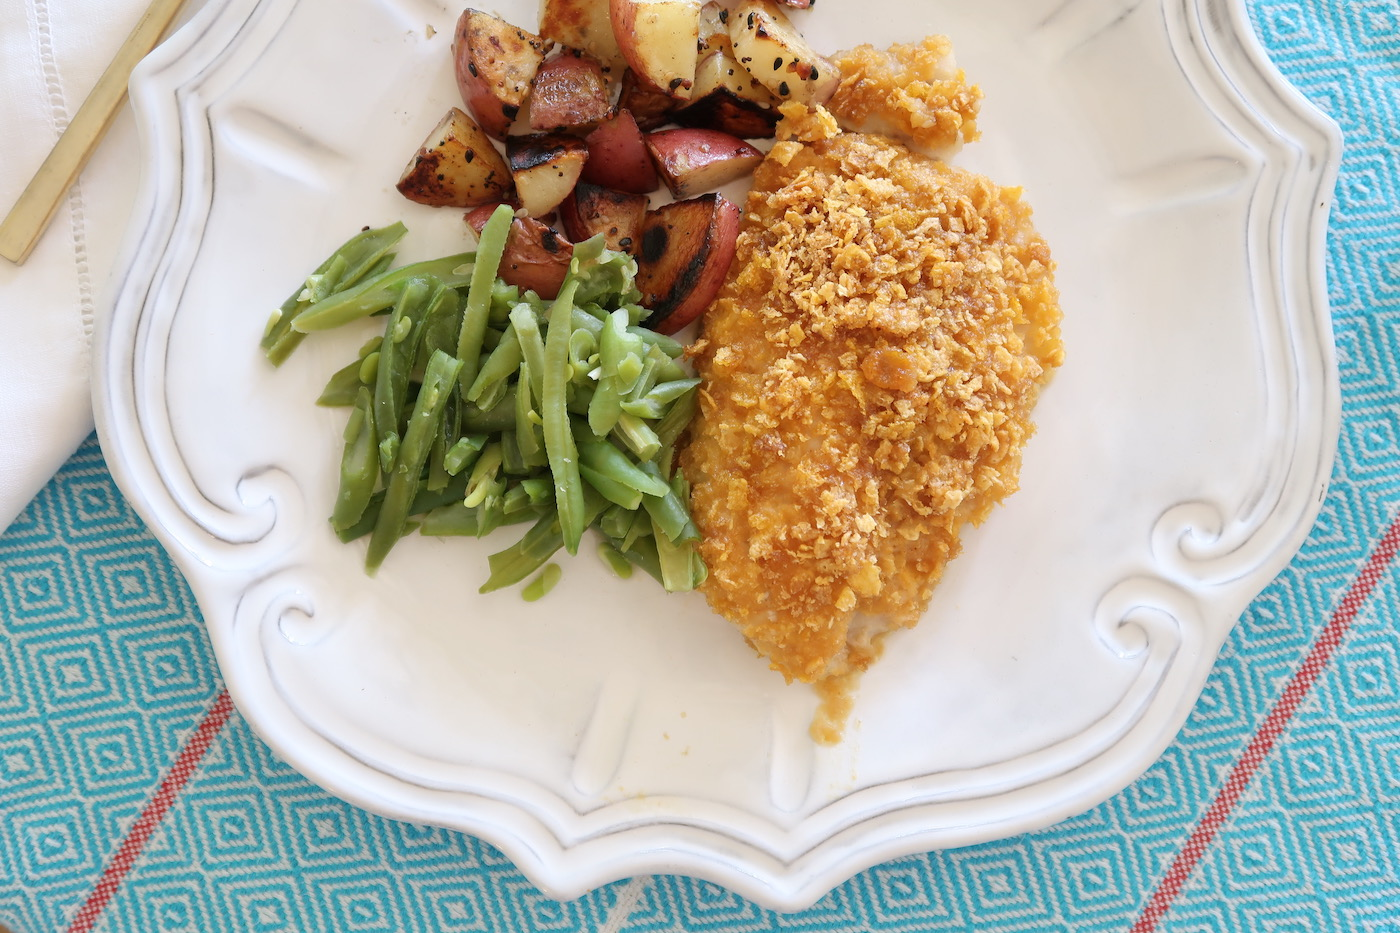 Sweet & Spicy Faux Fried Catfish Recipe made with U.S. Farm Raised Catfish